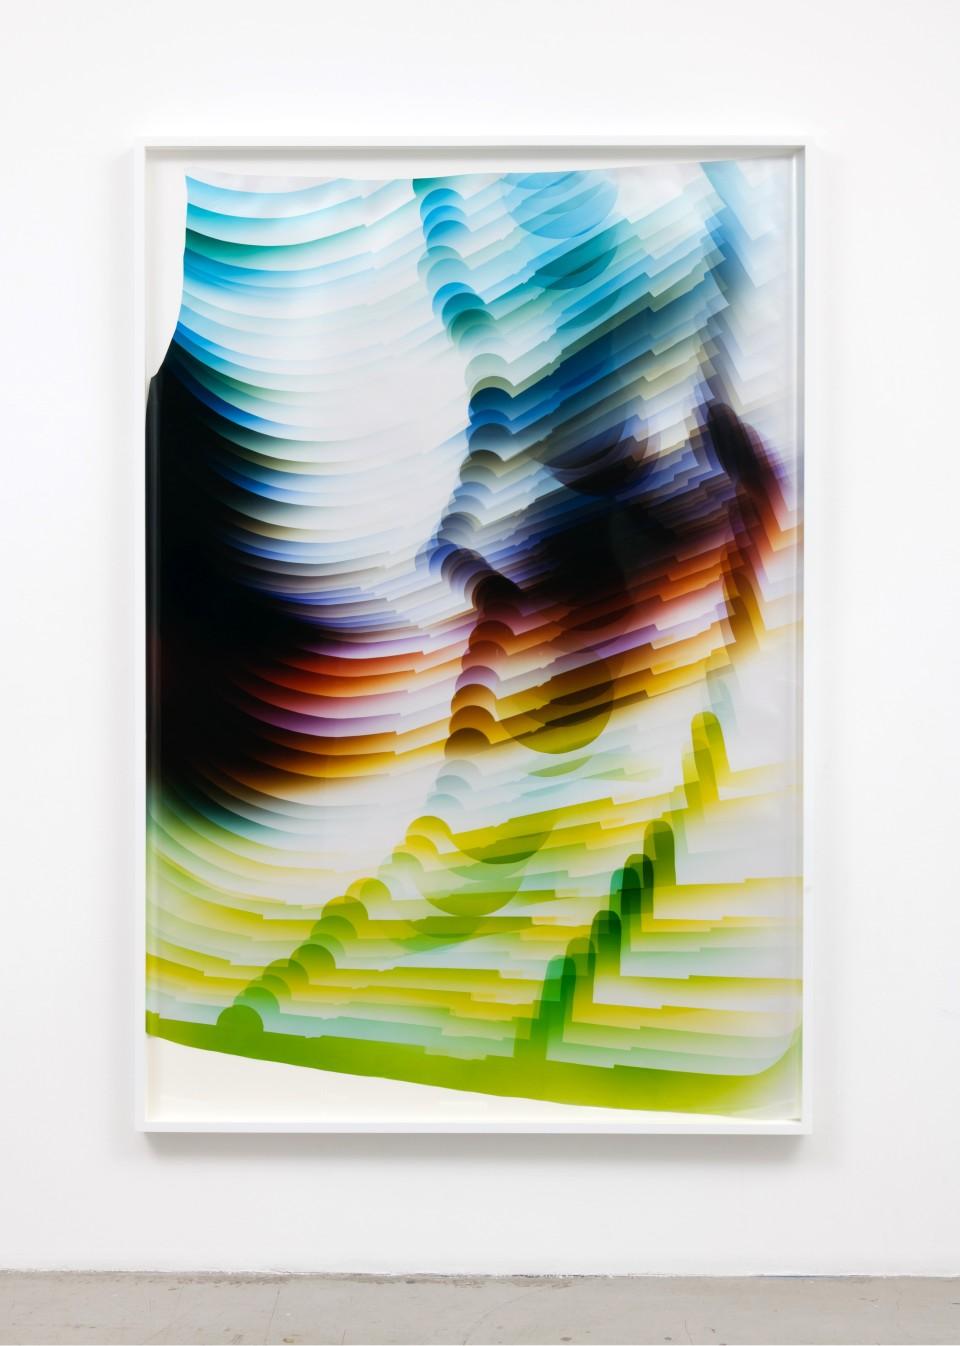 Image: Mariah Robertson, 227, 2017, unique chromogenic print, 72 x 49 inches